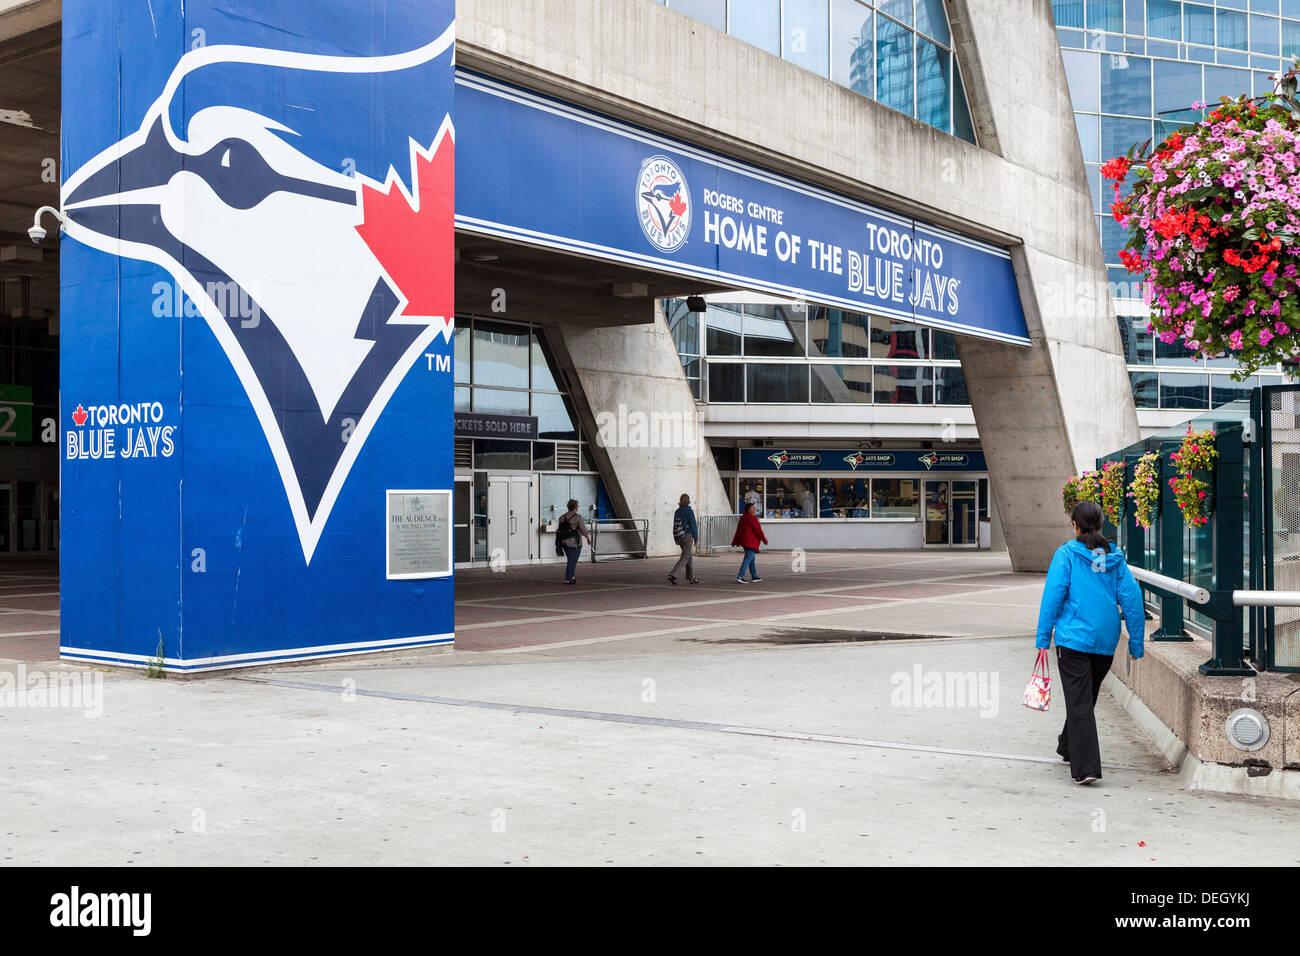 Entrance to the Rogers Centre, stadium of the Blue Jays baseball team, Toronto - Stock Image